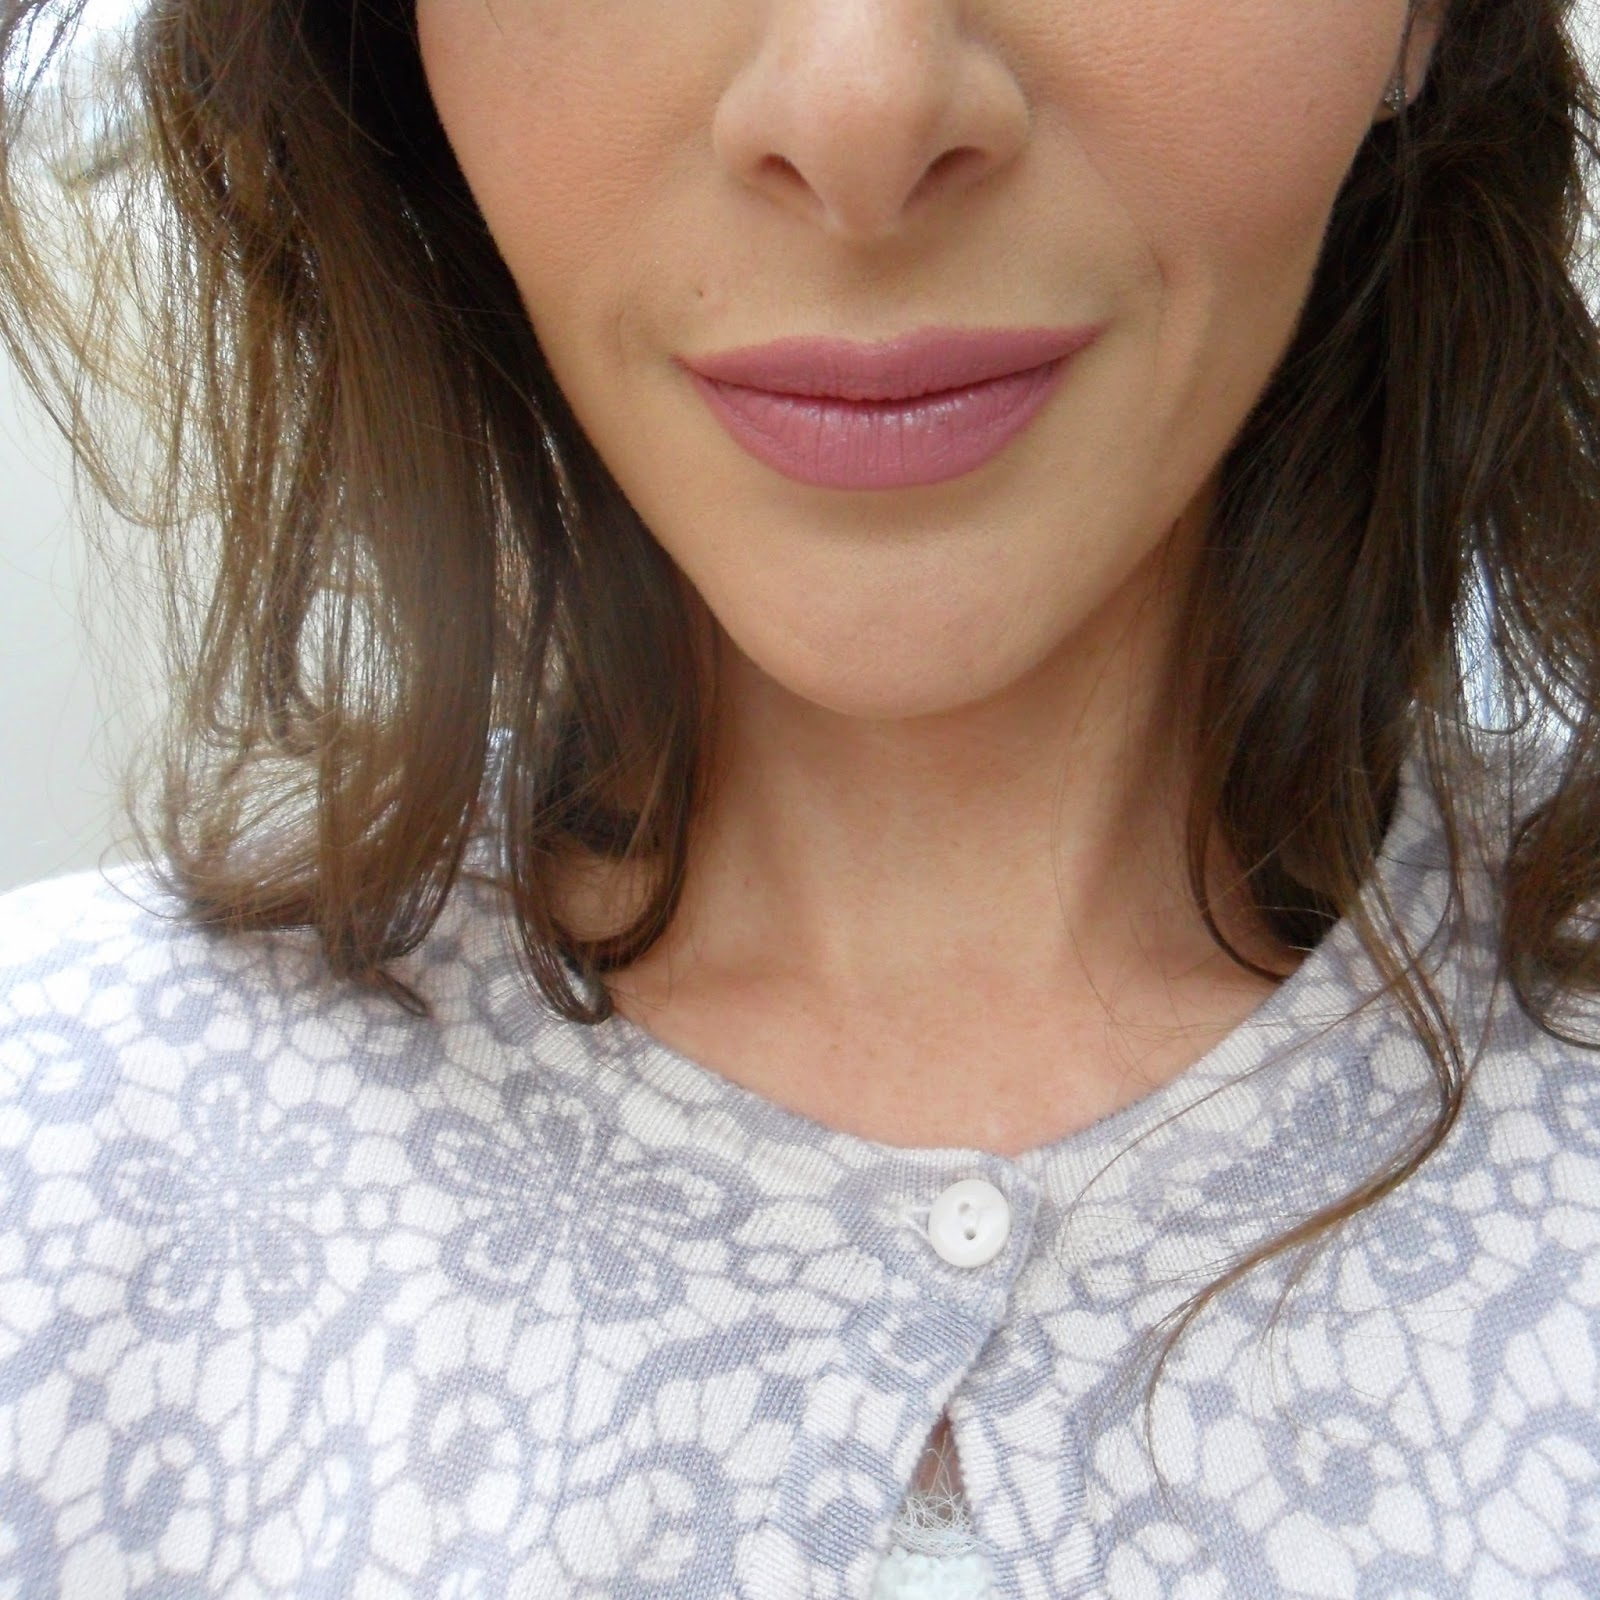 spring 2015 mac syrup lipstick